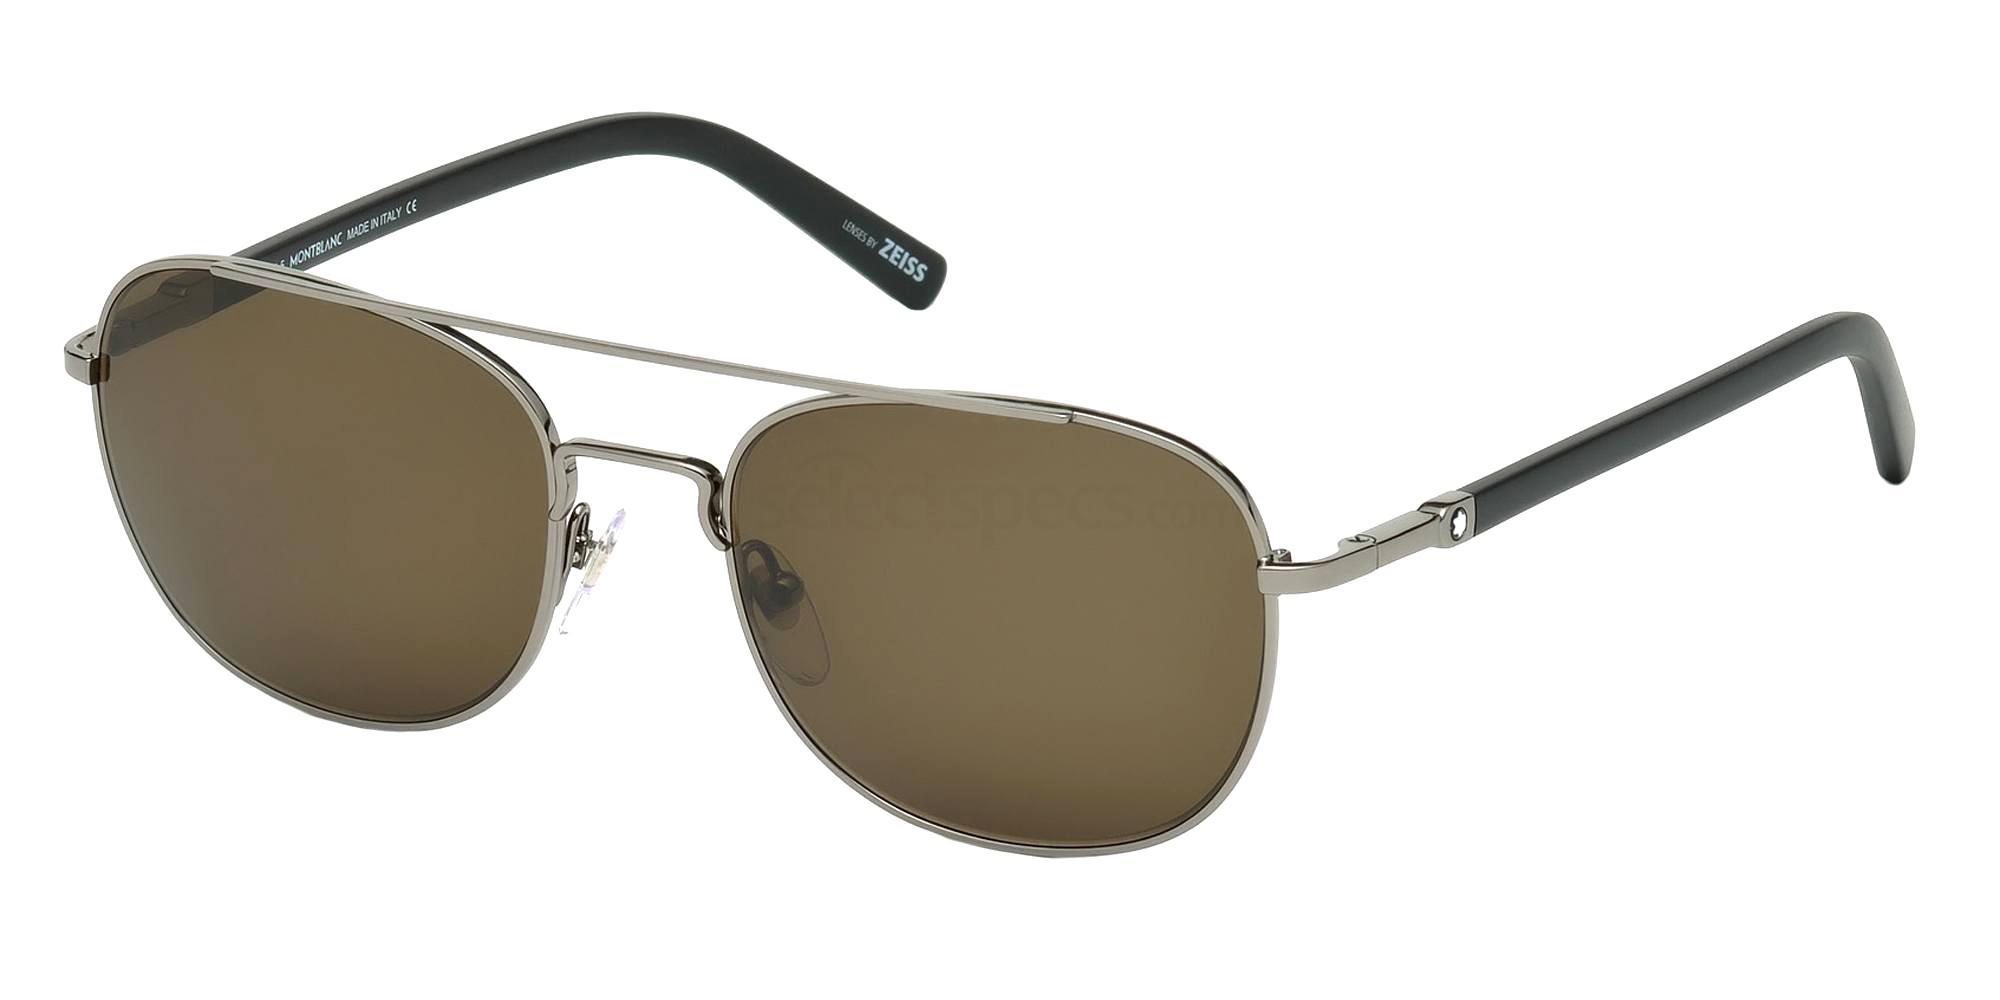 08J MB597S Sunglasses, Mont Blanc